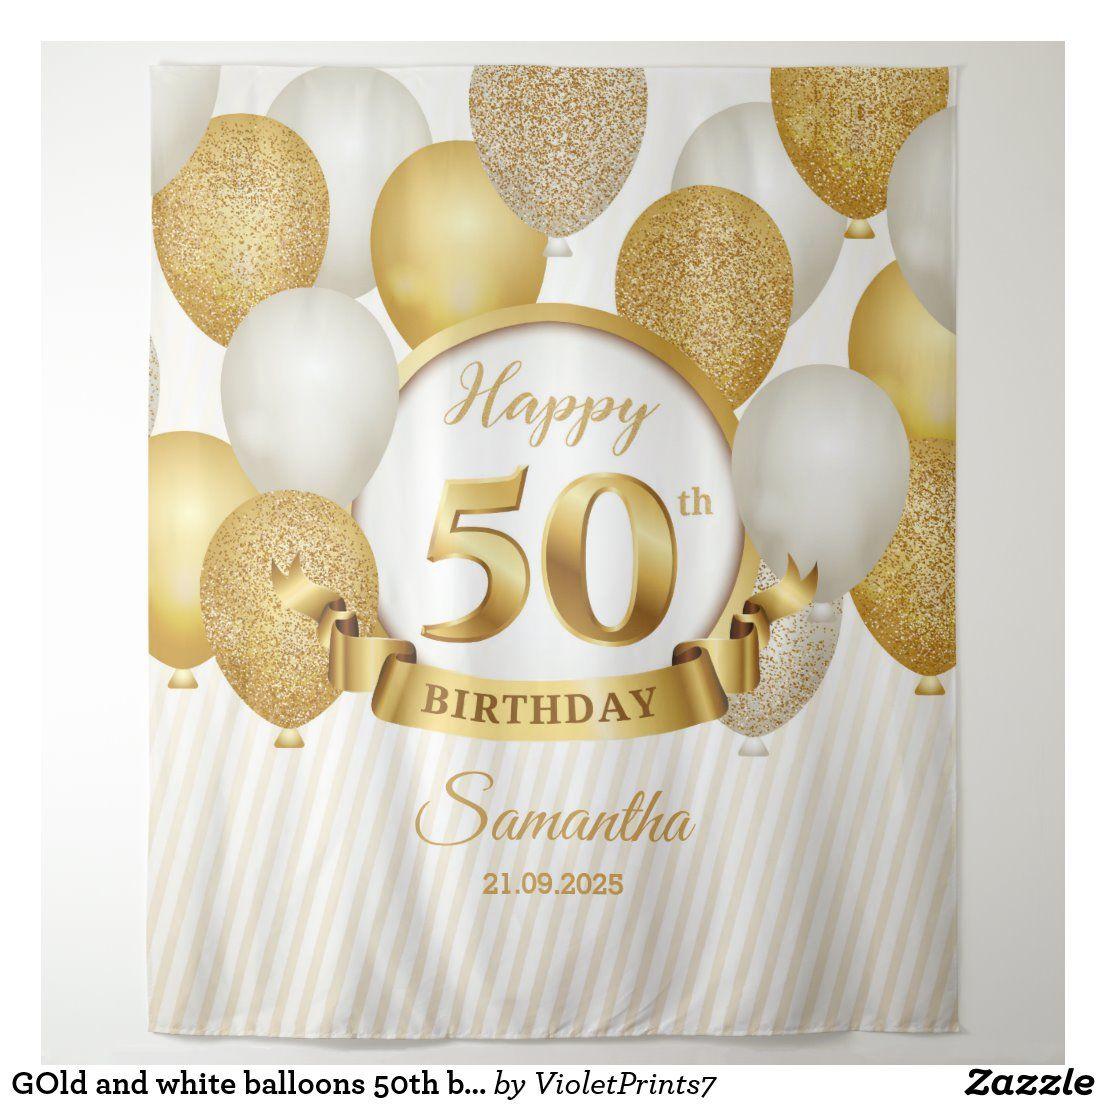 Gold And White Balloons 50th Birthday Backdrop Zazzle Com In 2021 50th Birthday Balloons Birthday Backdrop White Balloons